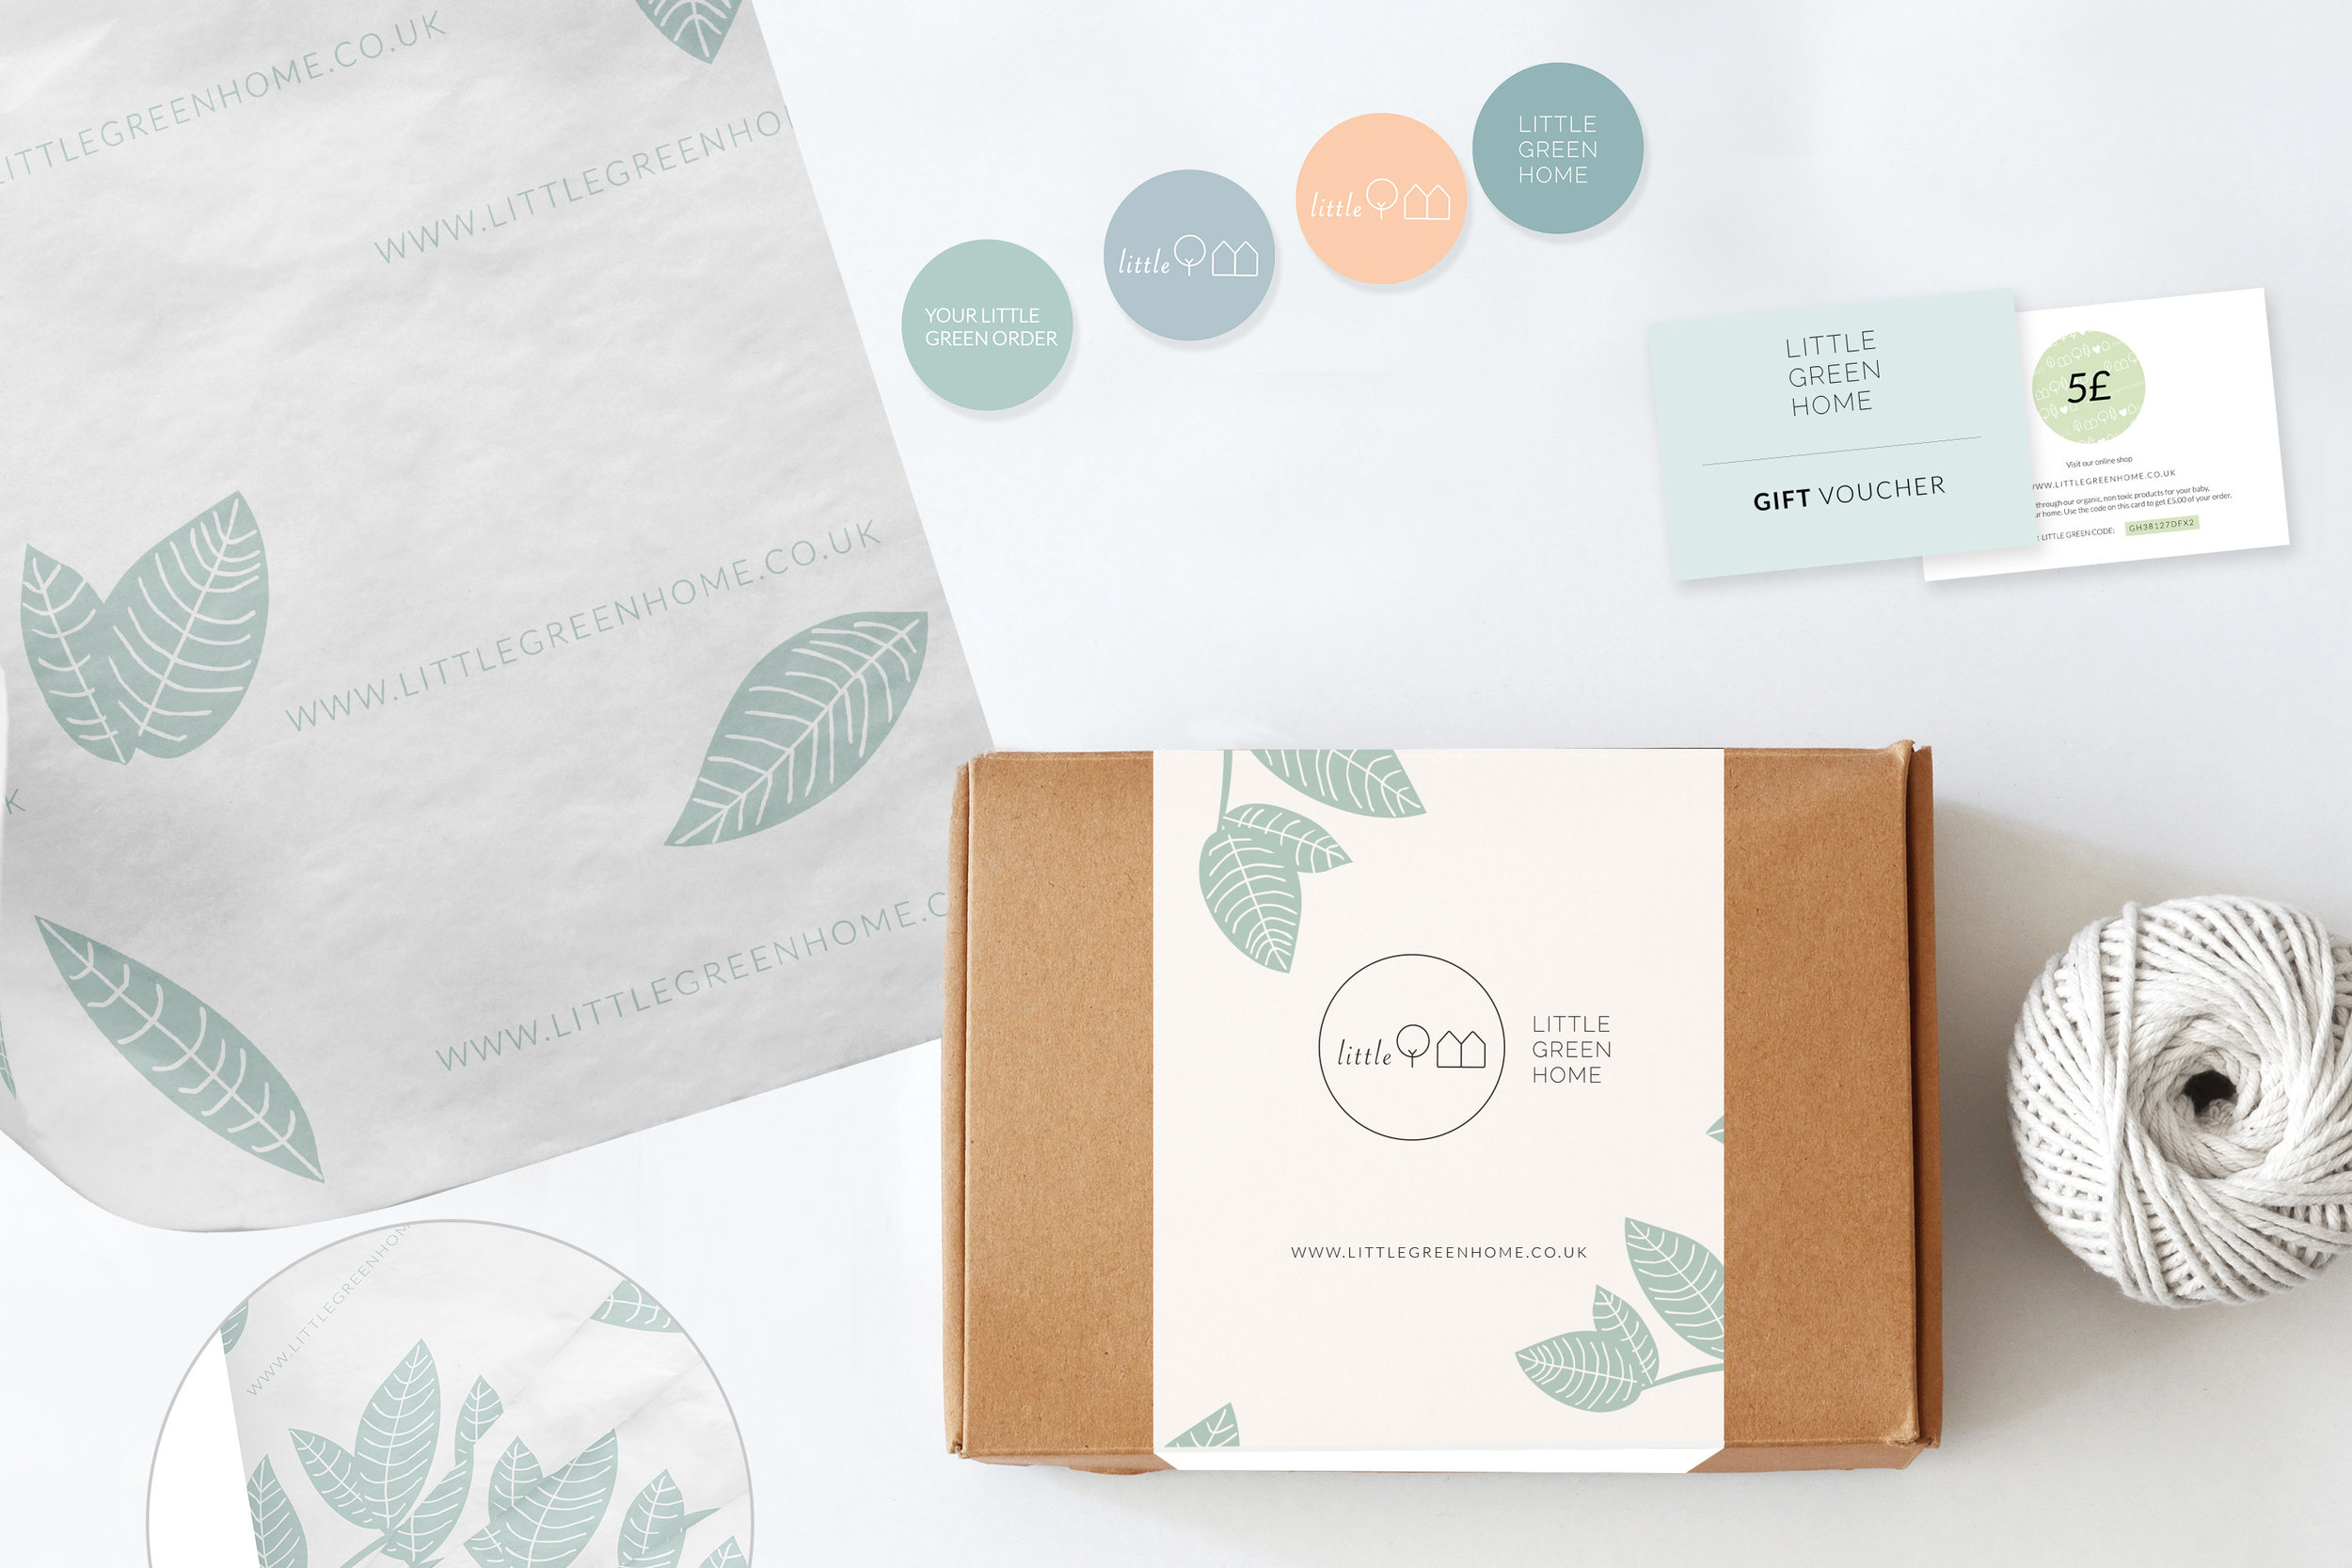 Little_Green_Home_packaging.jpg